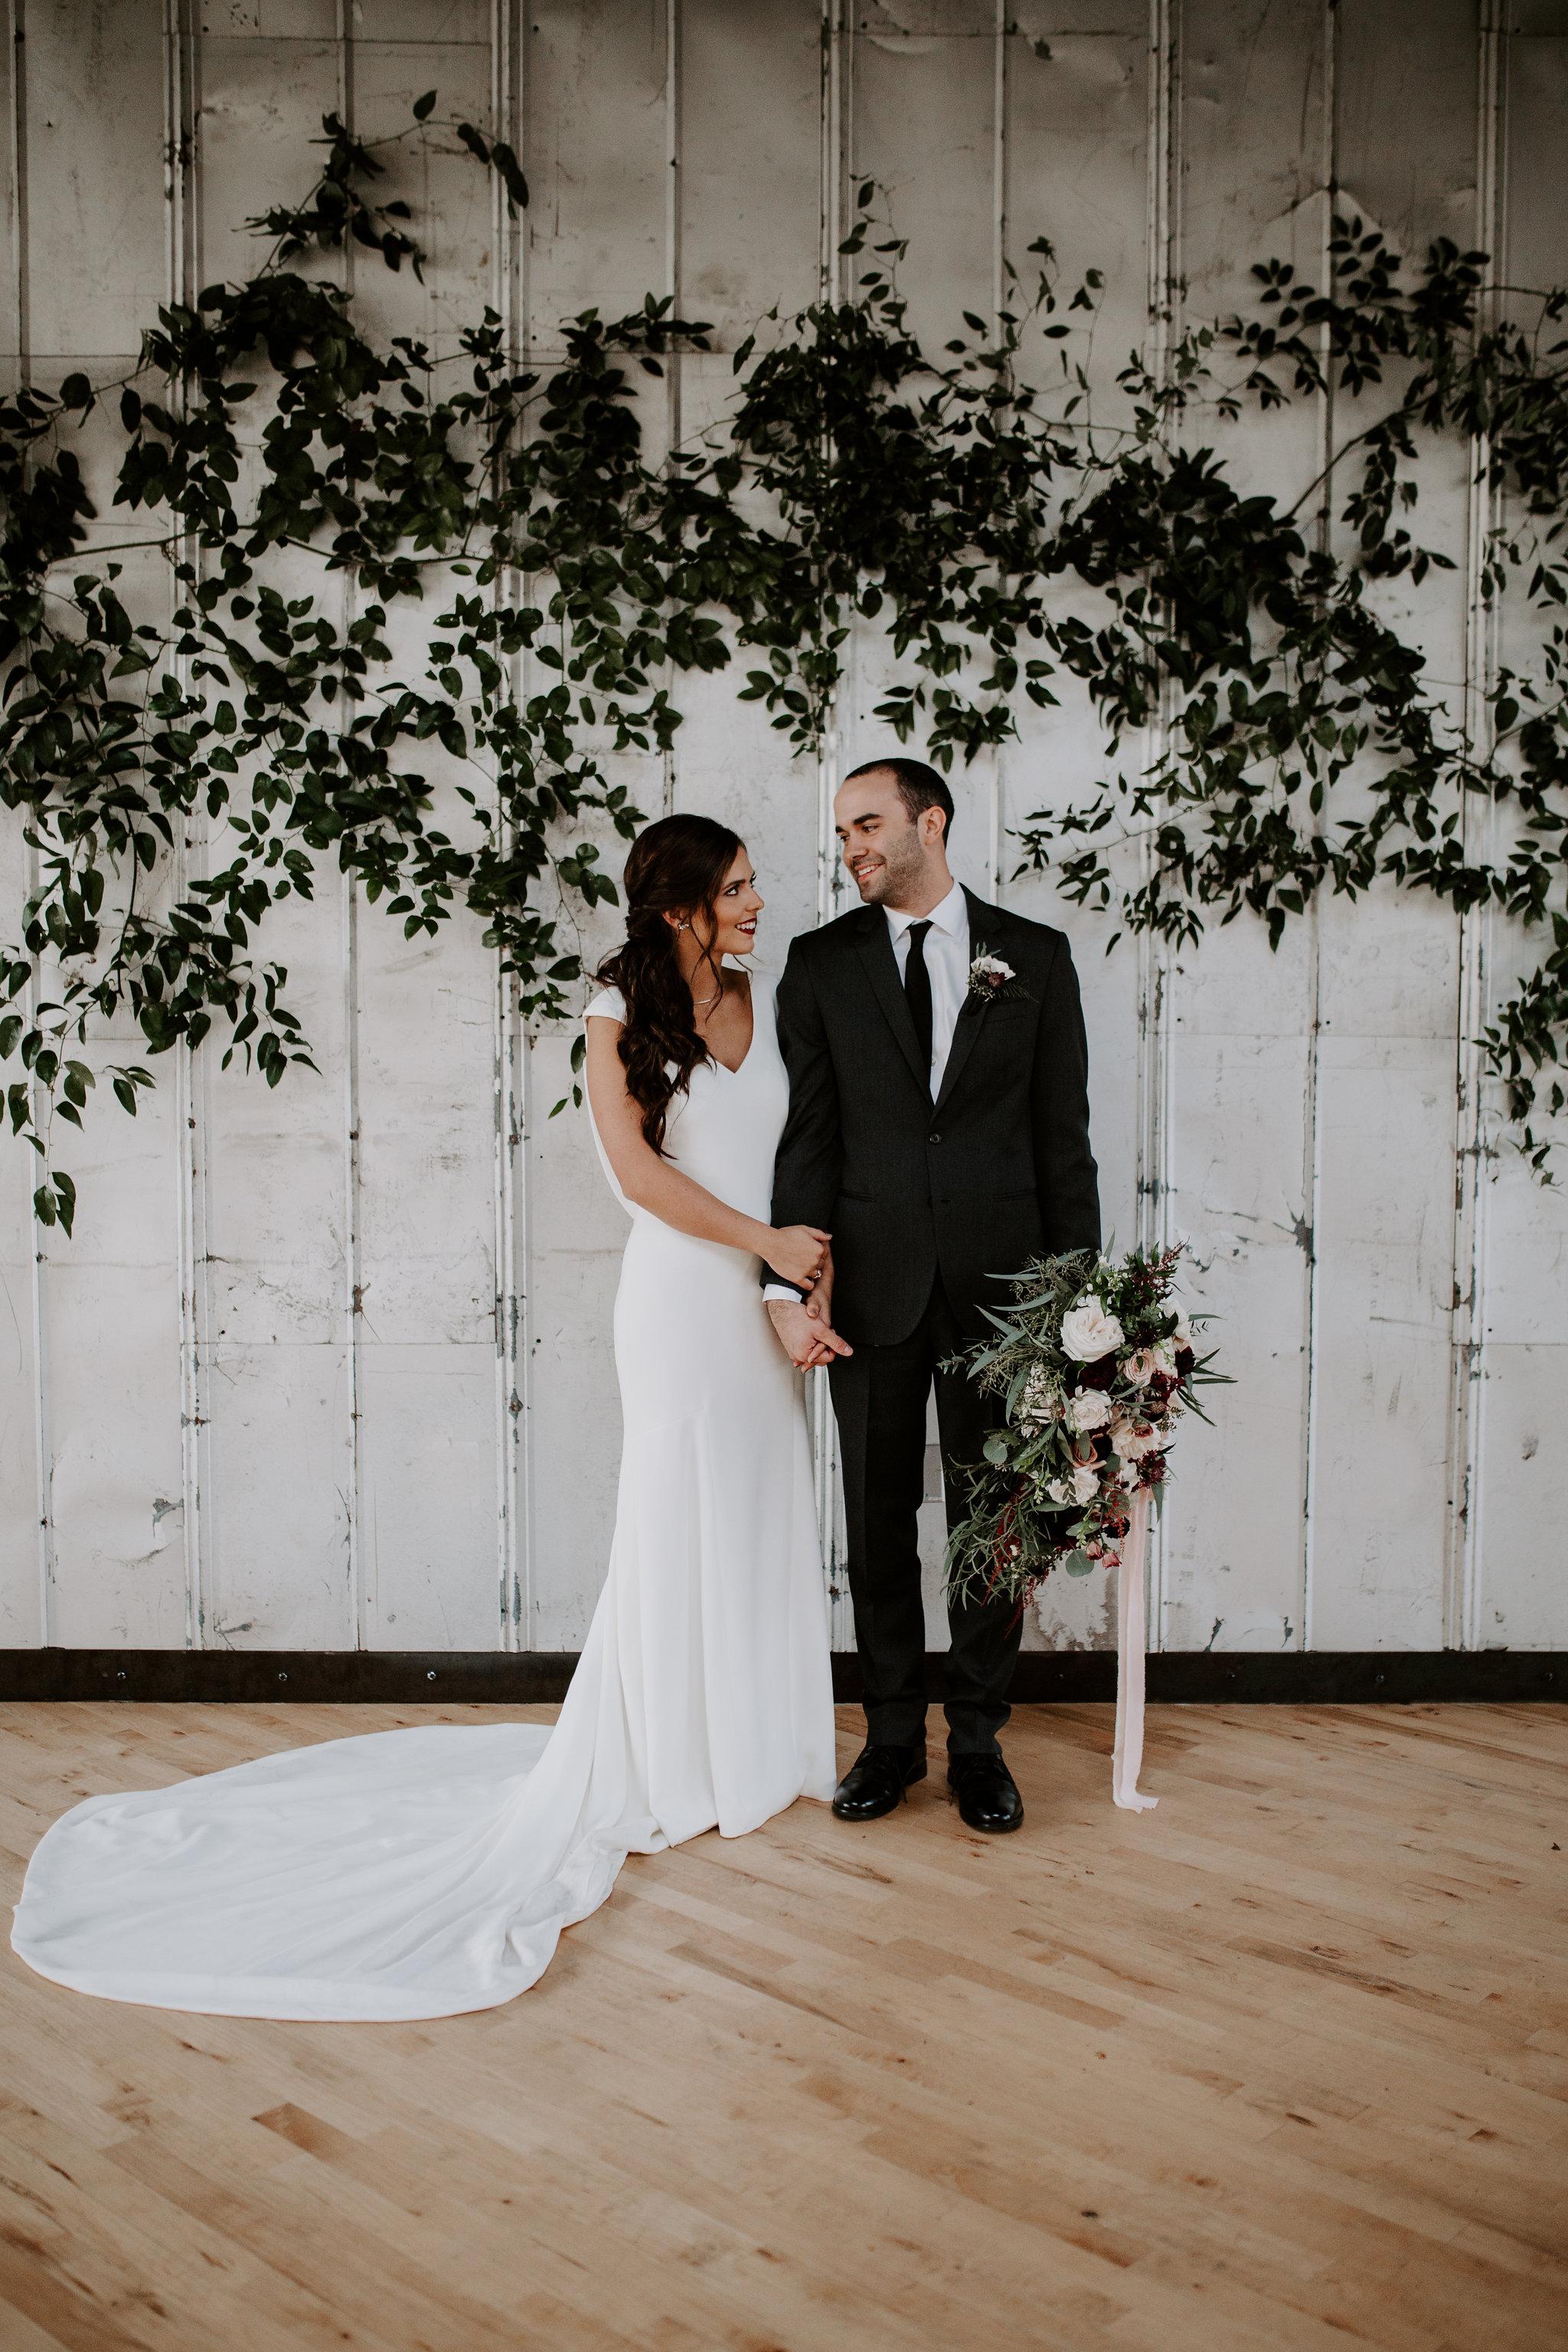 Minimalist Industrial Wedding A Griffin Events Mikayla Herrick DC545.jpg